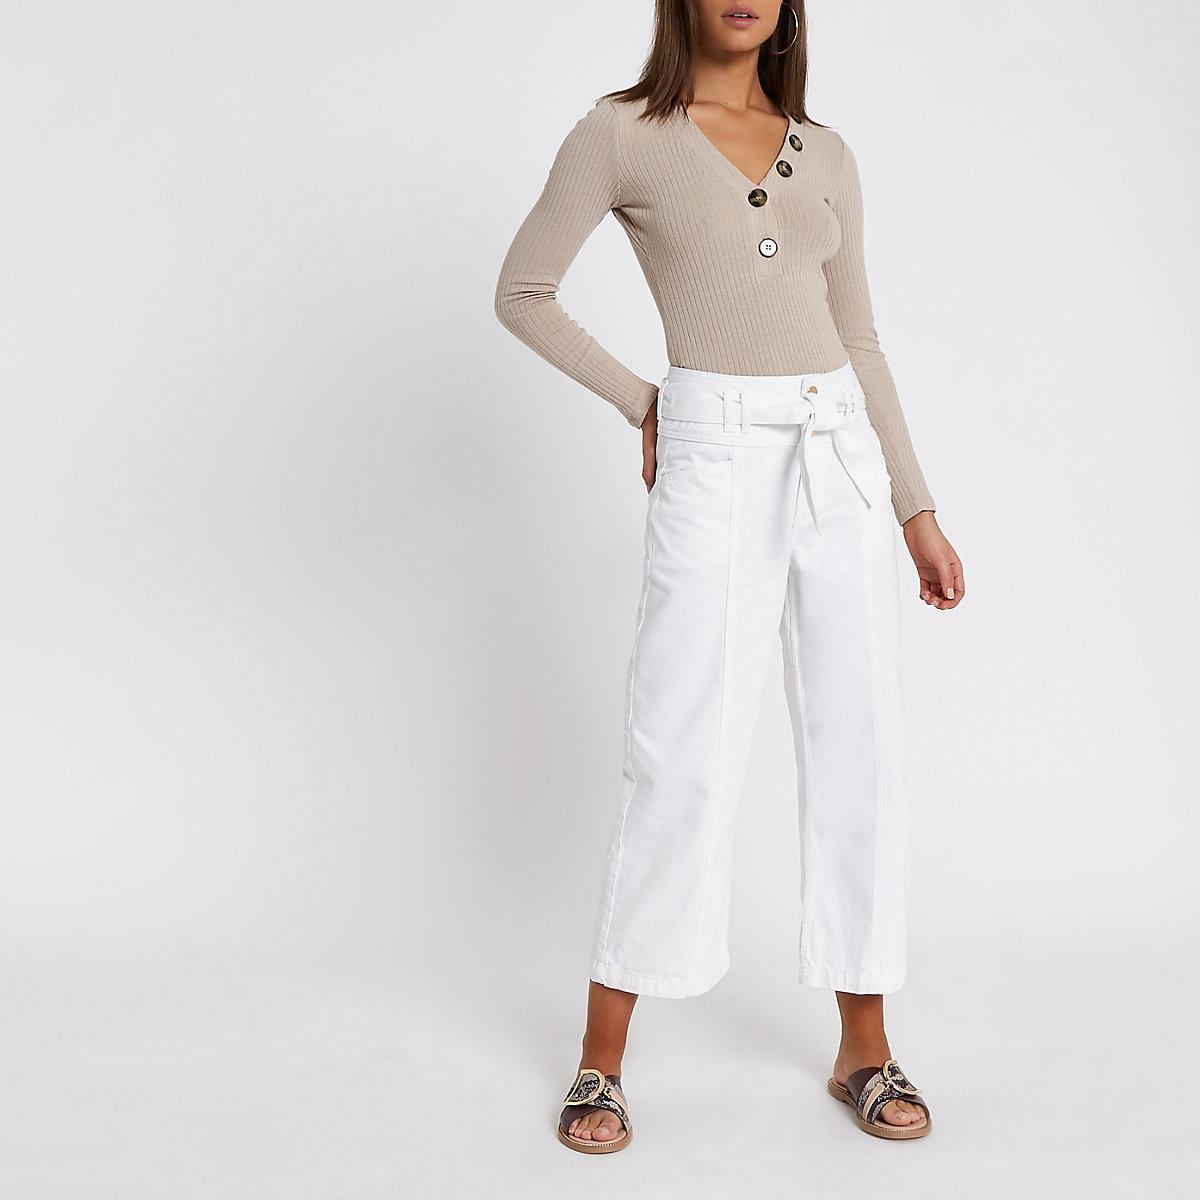 White denim belted culottes